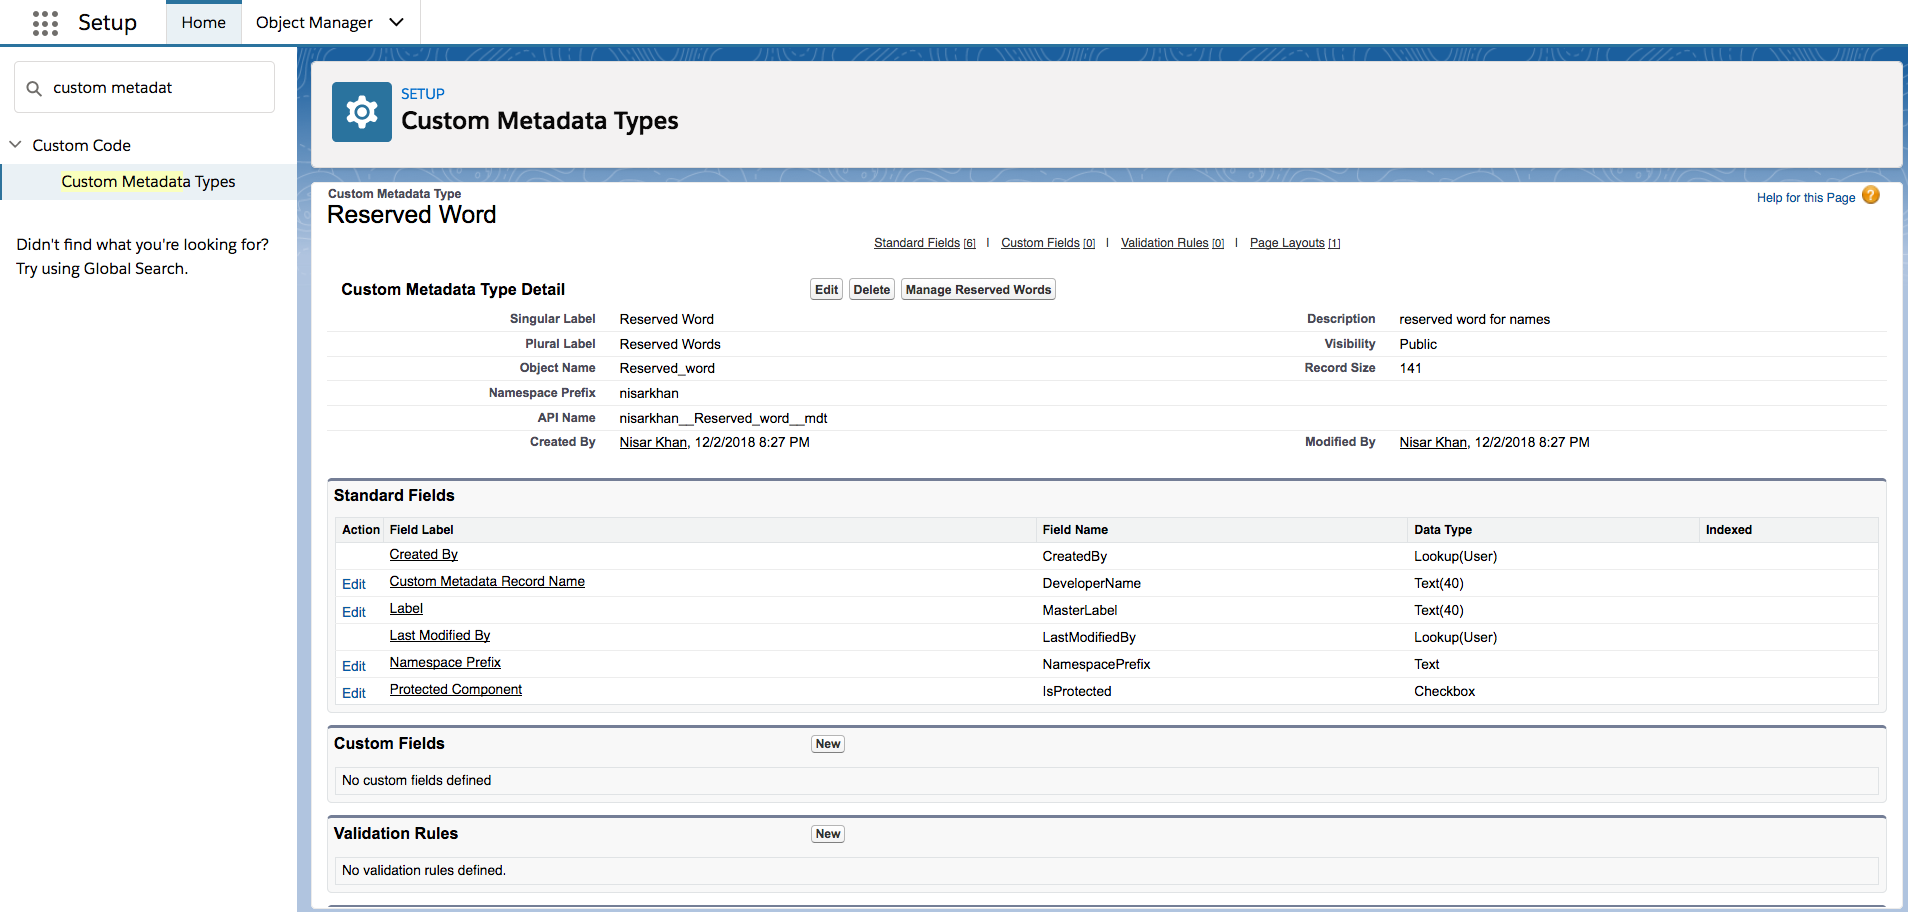 How to create apex trigger on custom metadata type